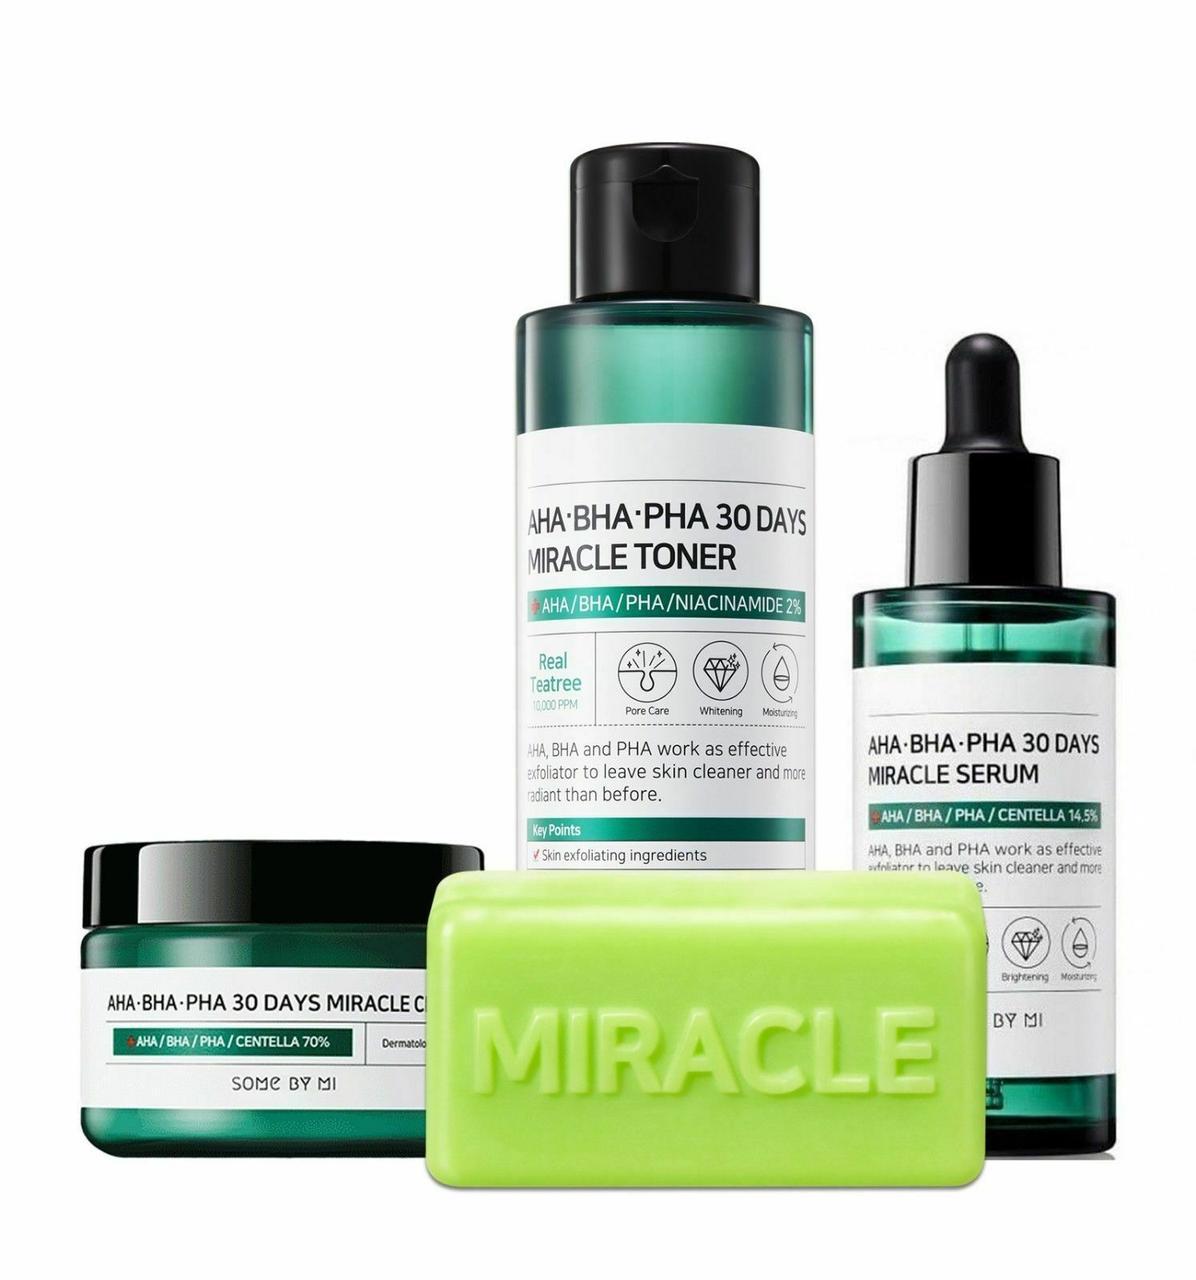 Набор для проблемной кожи с кислотами Some By Mi AHA/BHA/PHA 30Days Miracle Starer Kit Edition